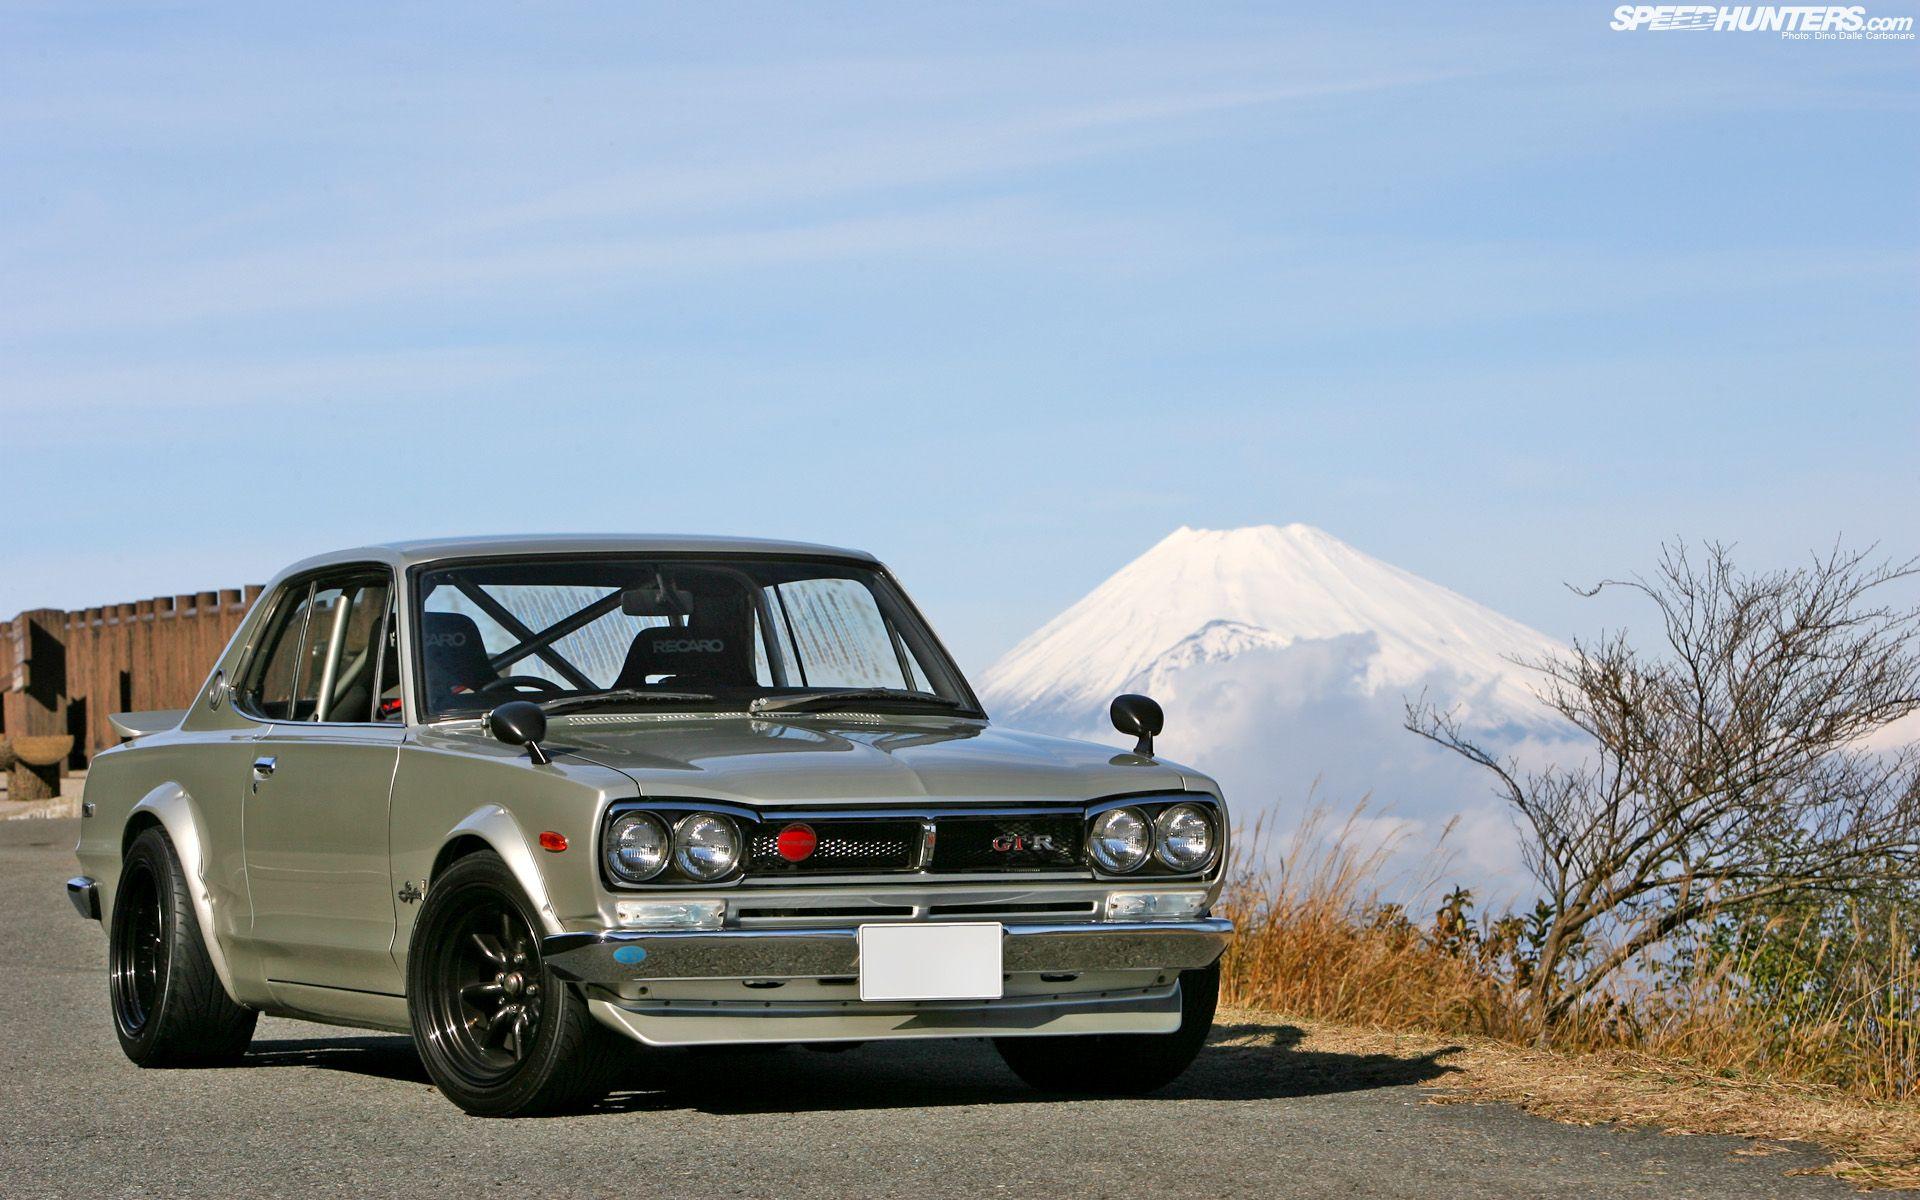 Nissan kpgc10 skyline gt r nissan pinterest skyline gt jdm japanese domestic market japan mount fuji nissan nissan skyline gt r wallpaper vanachro Choice Image